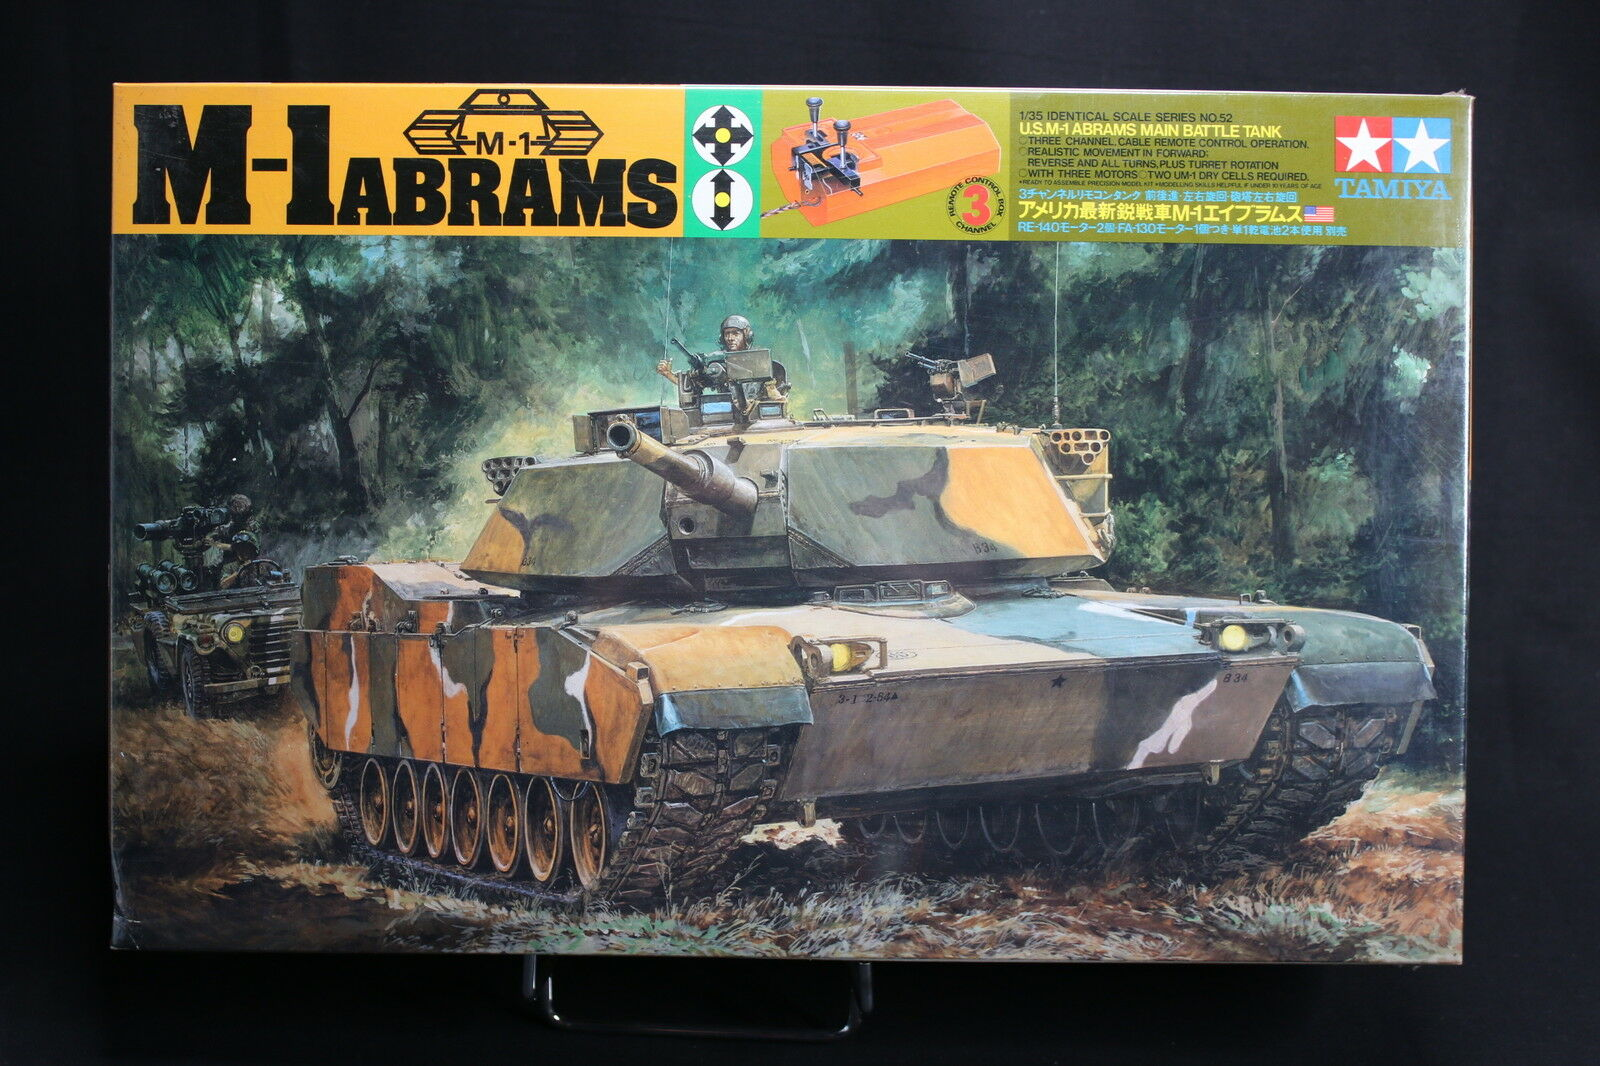 venta con descuento XE042 TAMIYA1 35 maquette char 30254 52 US US US M-1 Abrams main battle tank motorisé  buena calidad